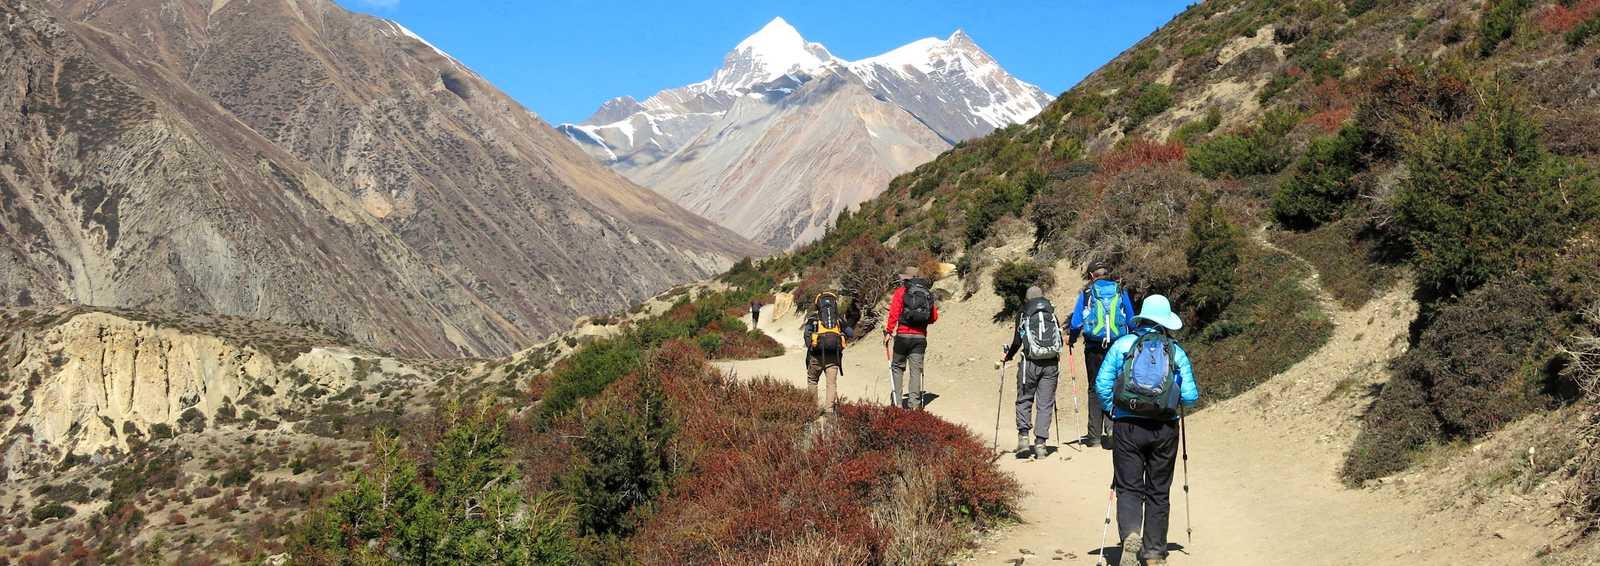 Trekkers on the mini-Annapurna Circuit